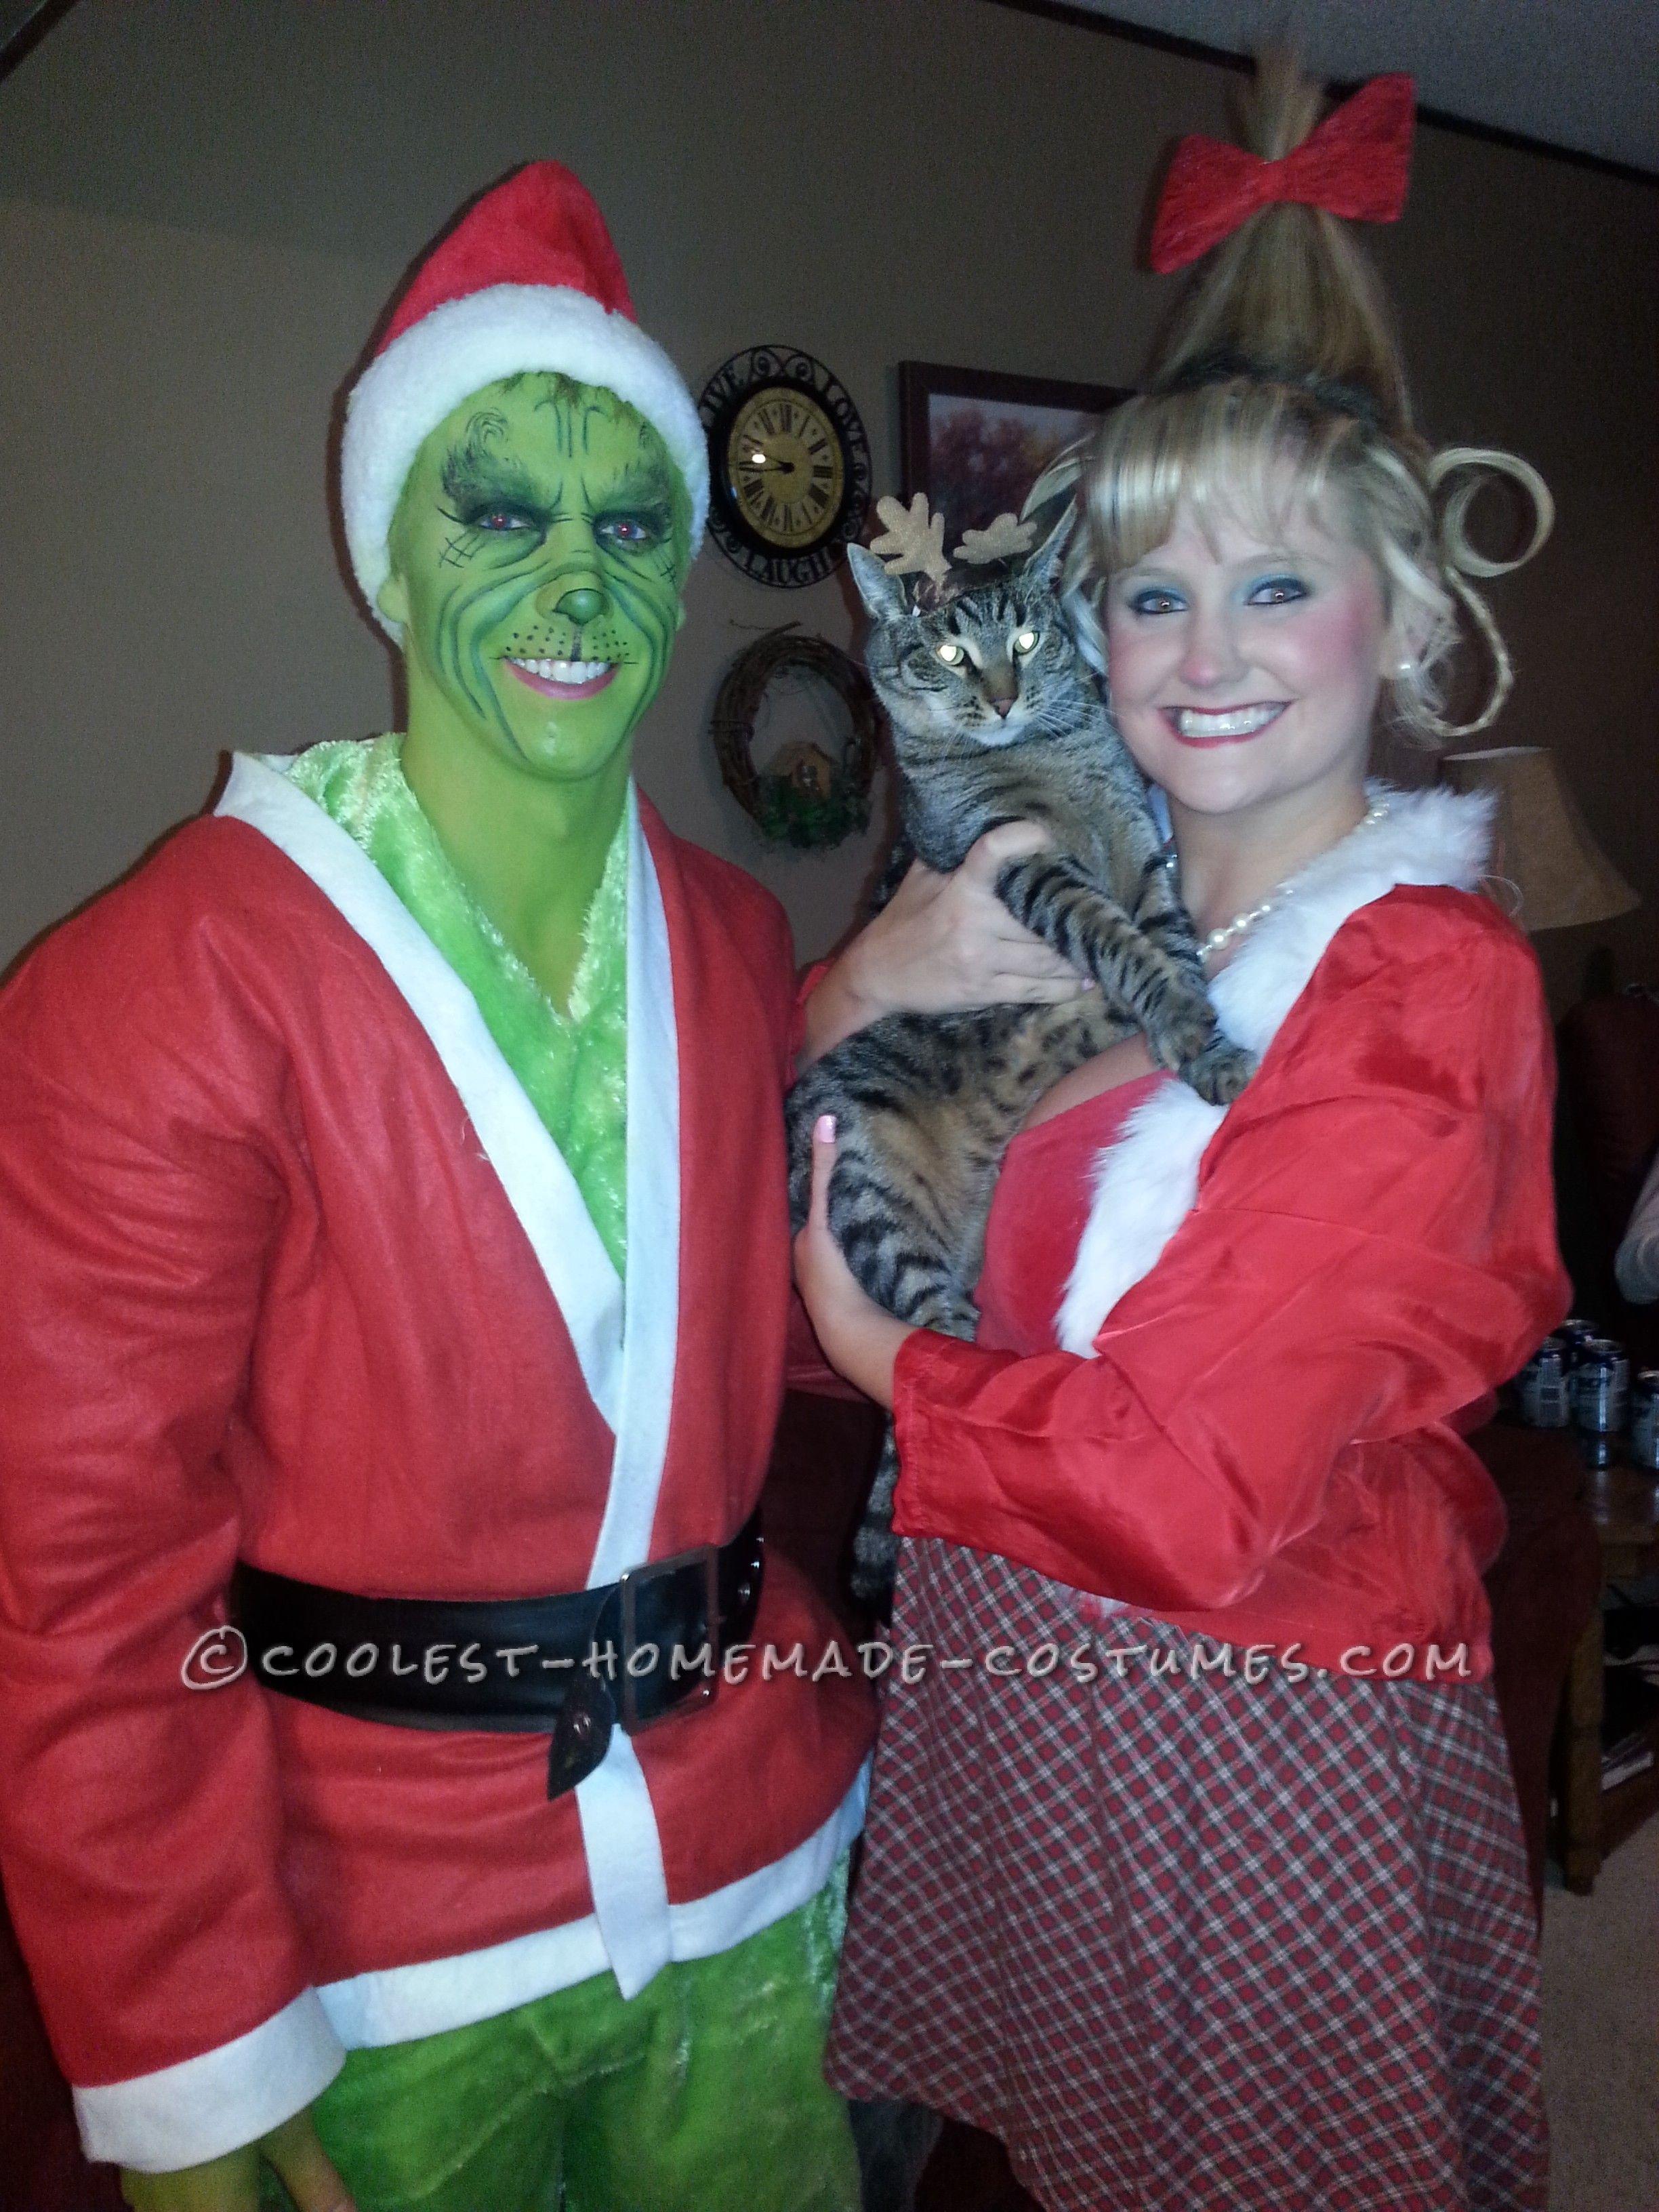 10 Pretty Good Couples Halloween Costume Ideas cool couples halloween costume grinch and cindy lou who 2020